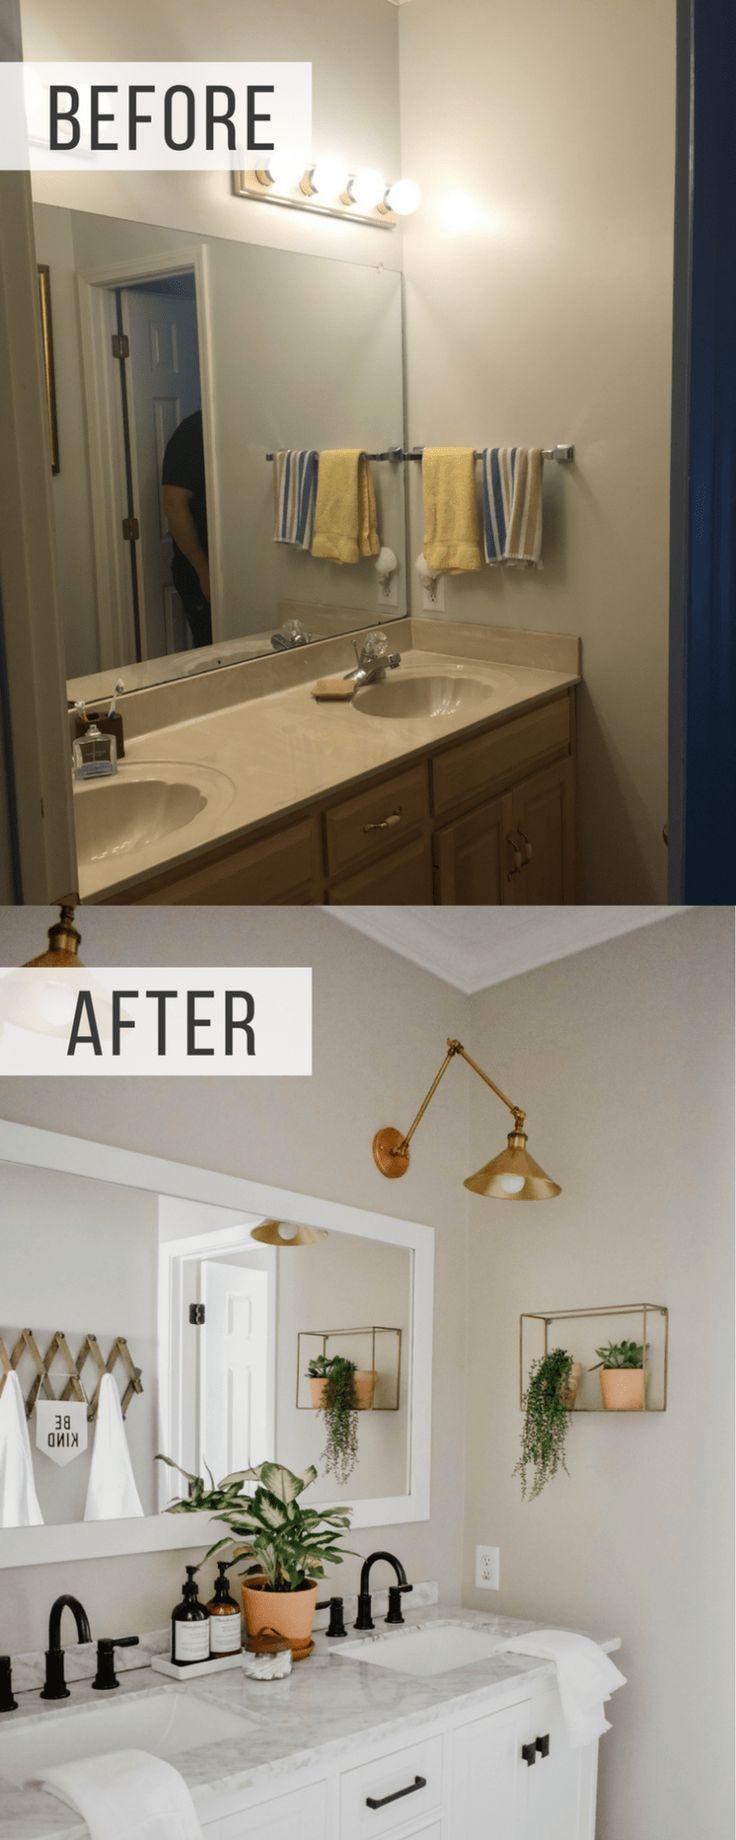 Remodelar baño, remodelar baño pequeño, baño boho moderno … baños